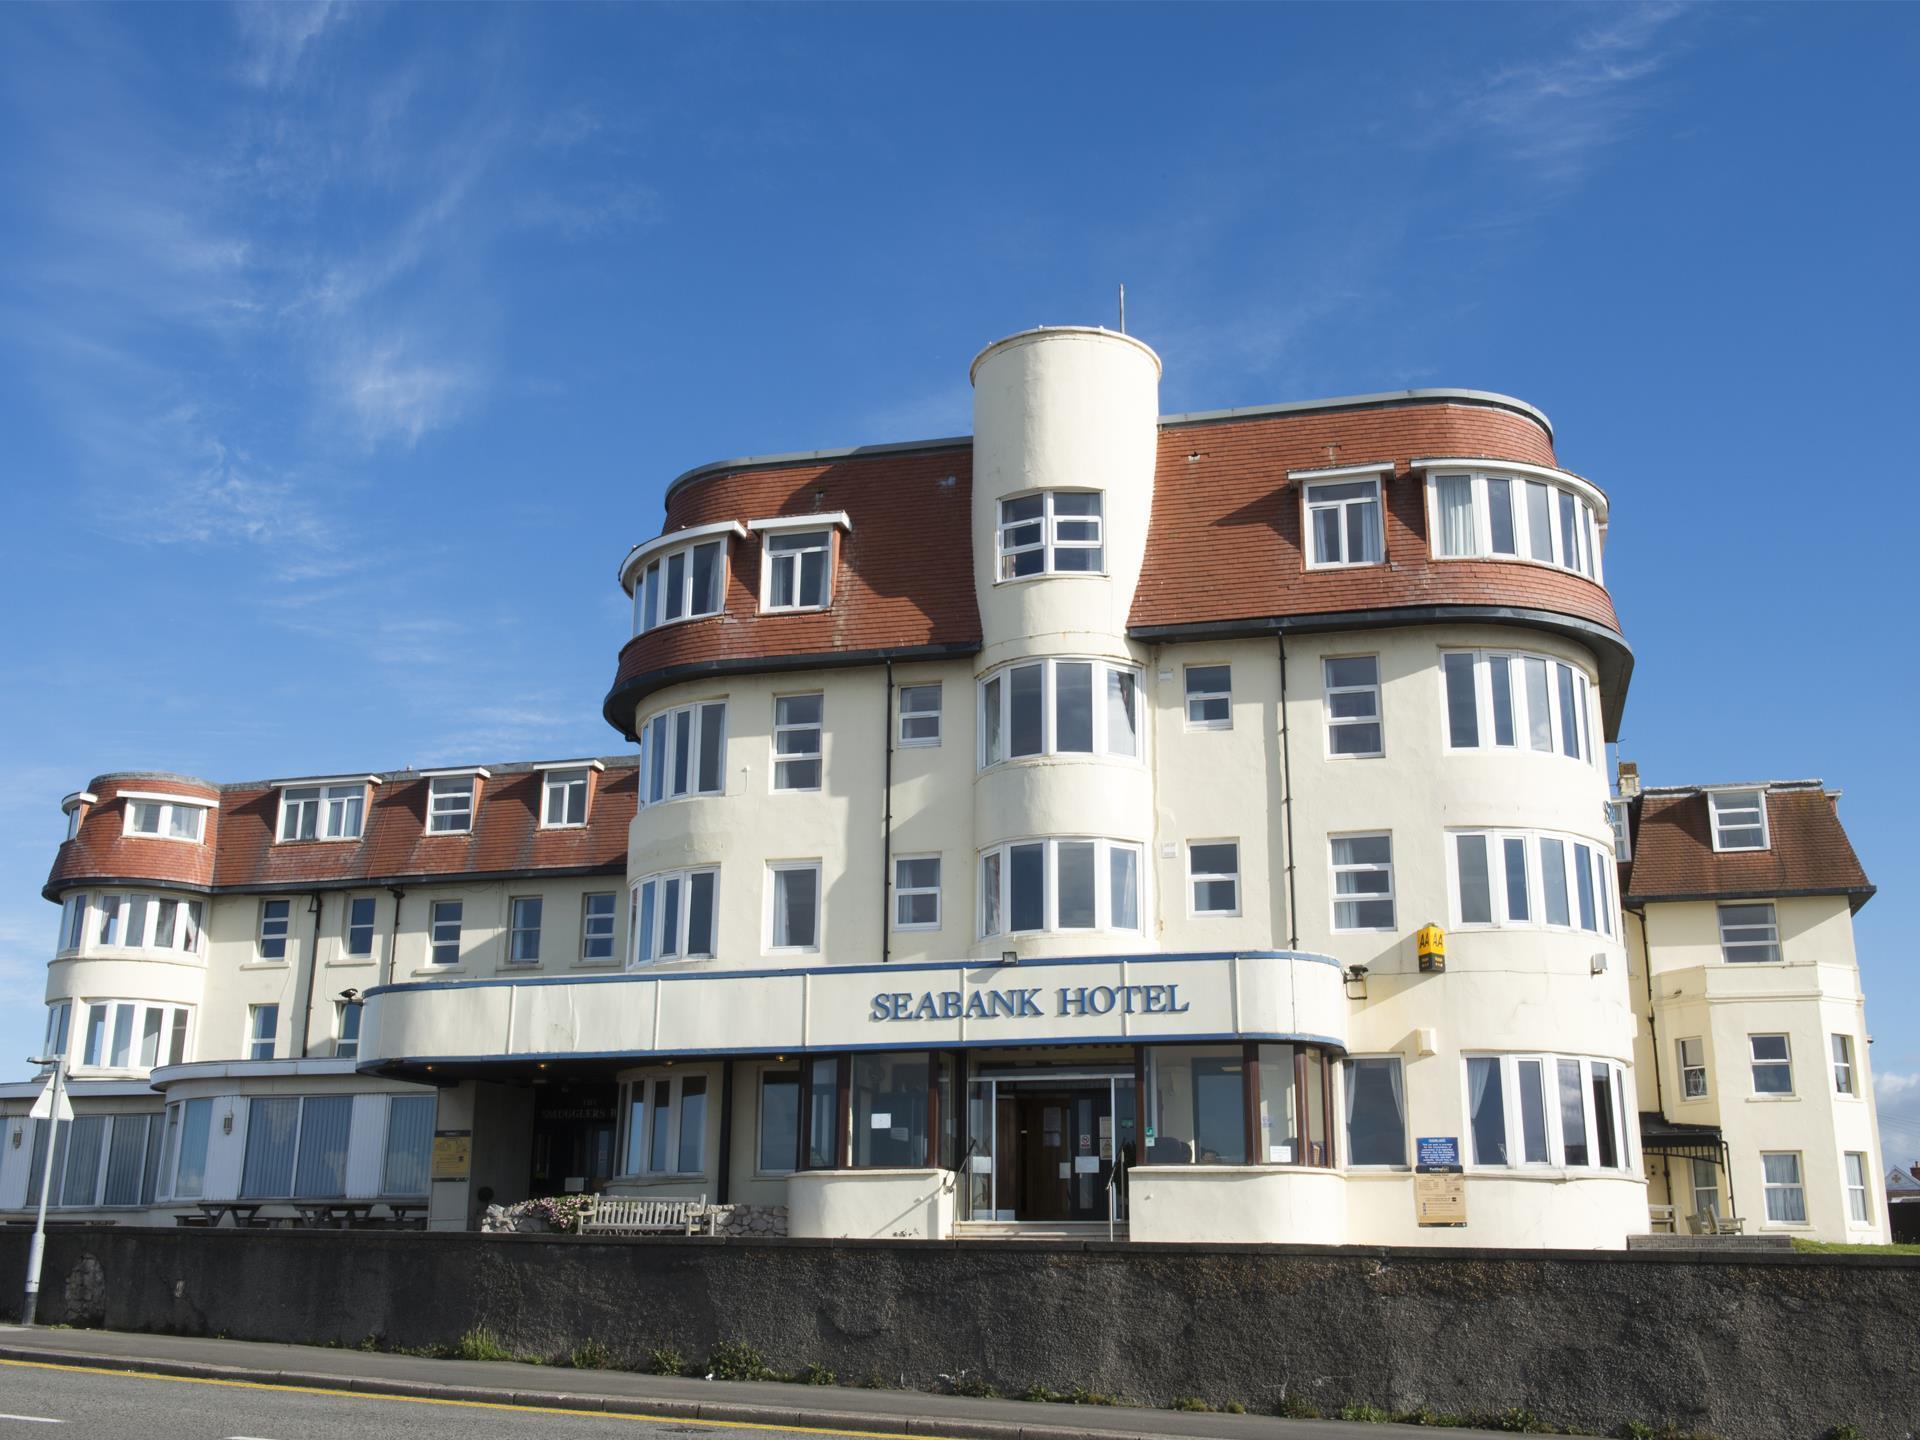 Seabank Hotel